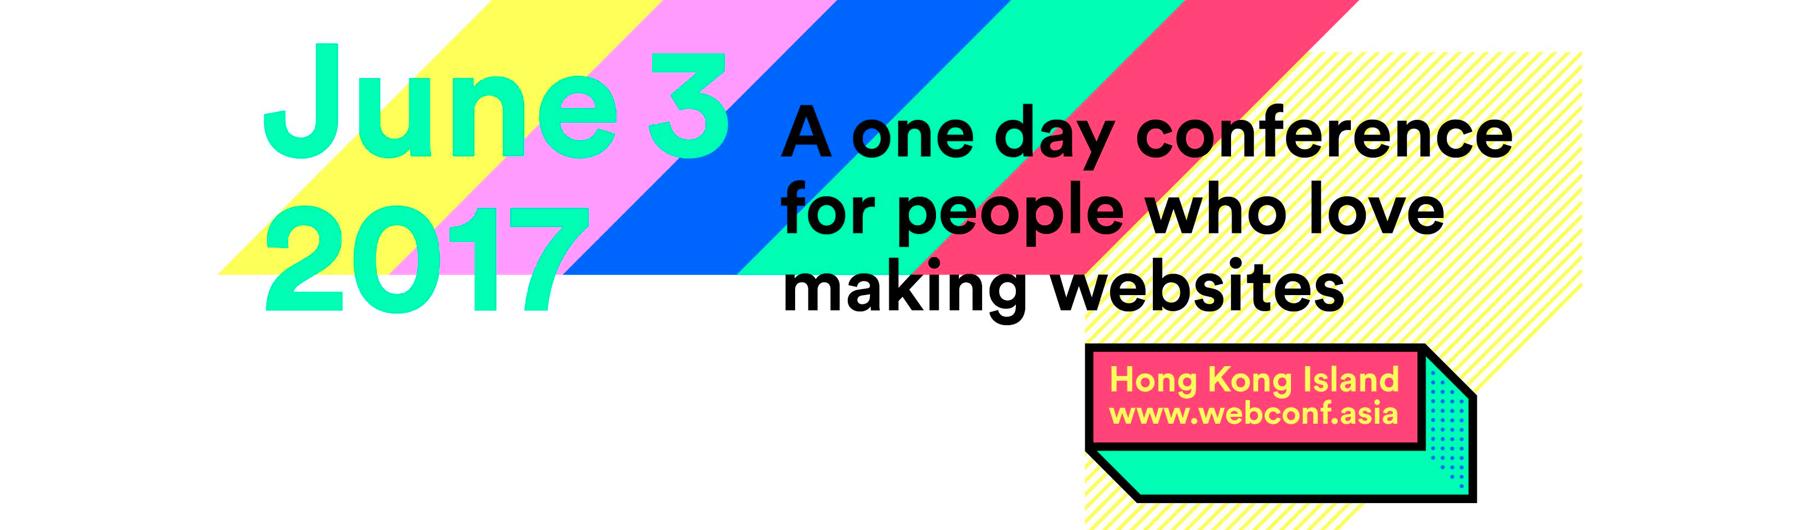 Webconf.asia 2017